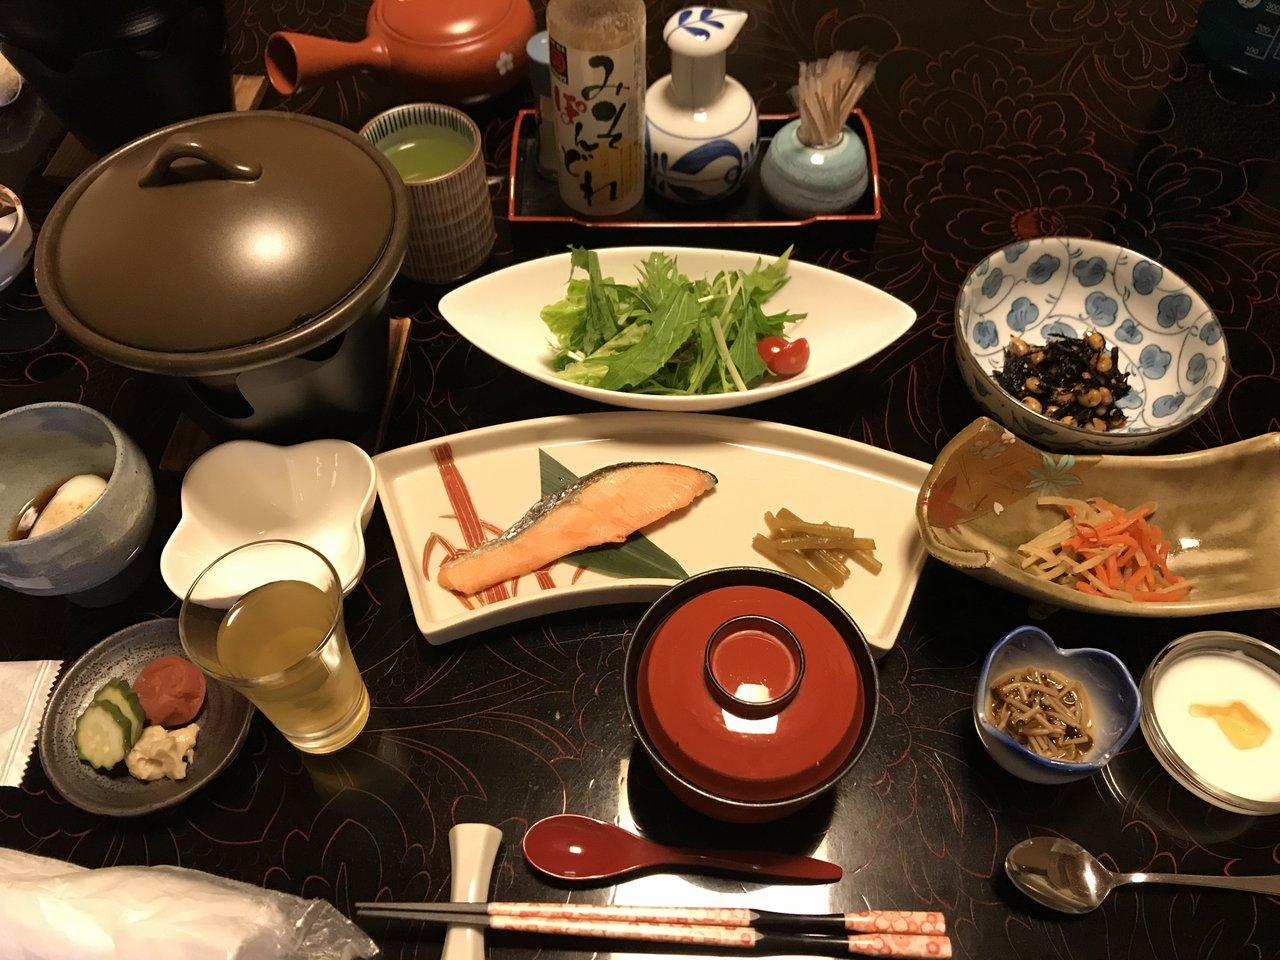 Dinner! | Photo taken by Pui san C